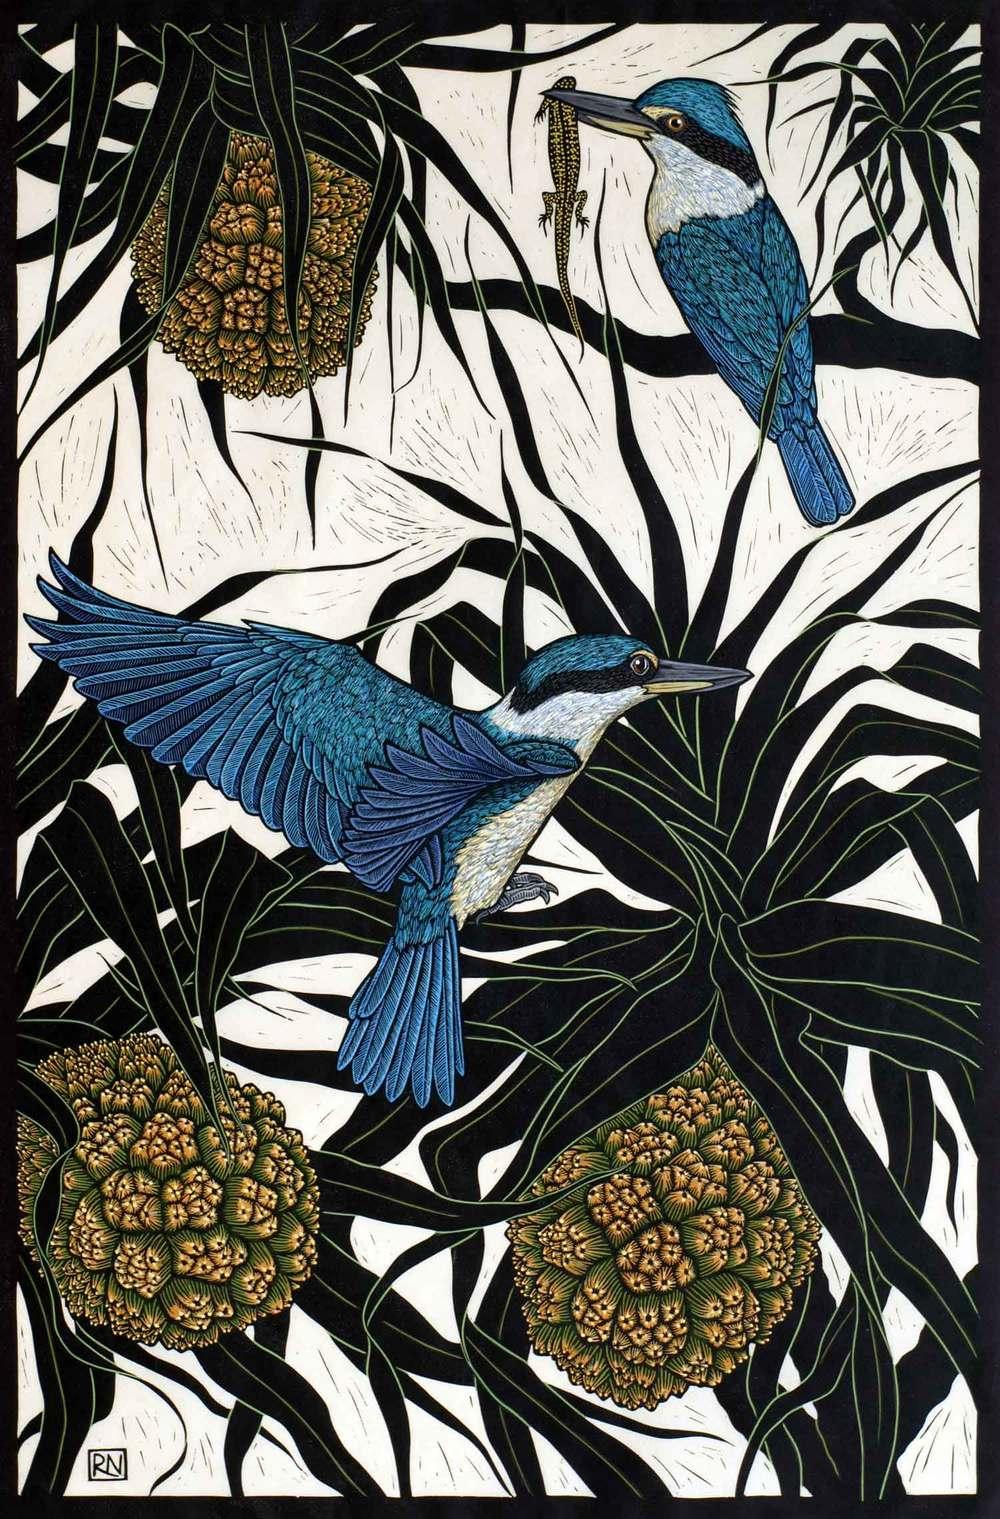 sacred-kingfisher-linocut-rachel-newling.jpg